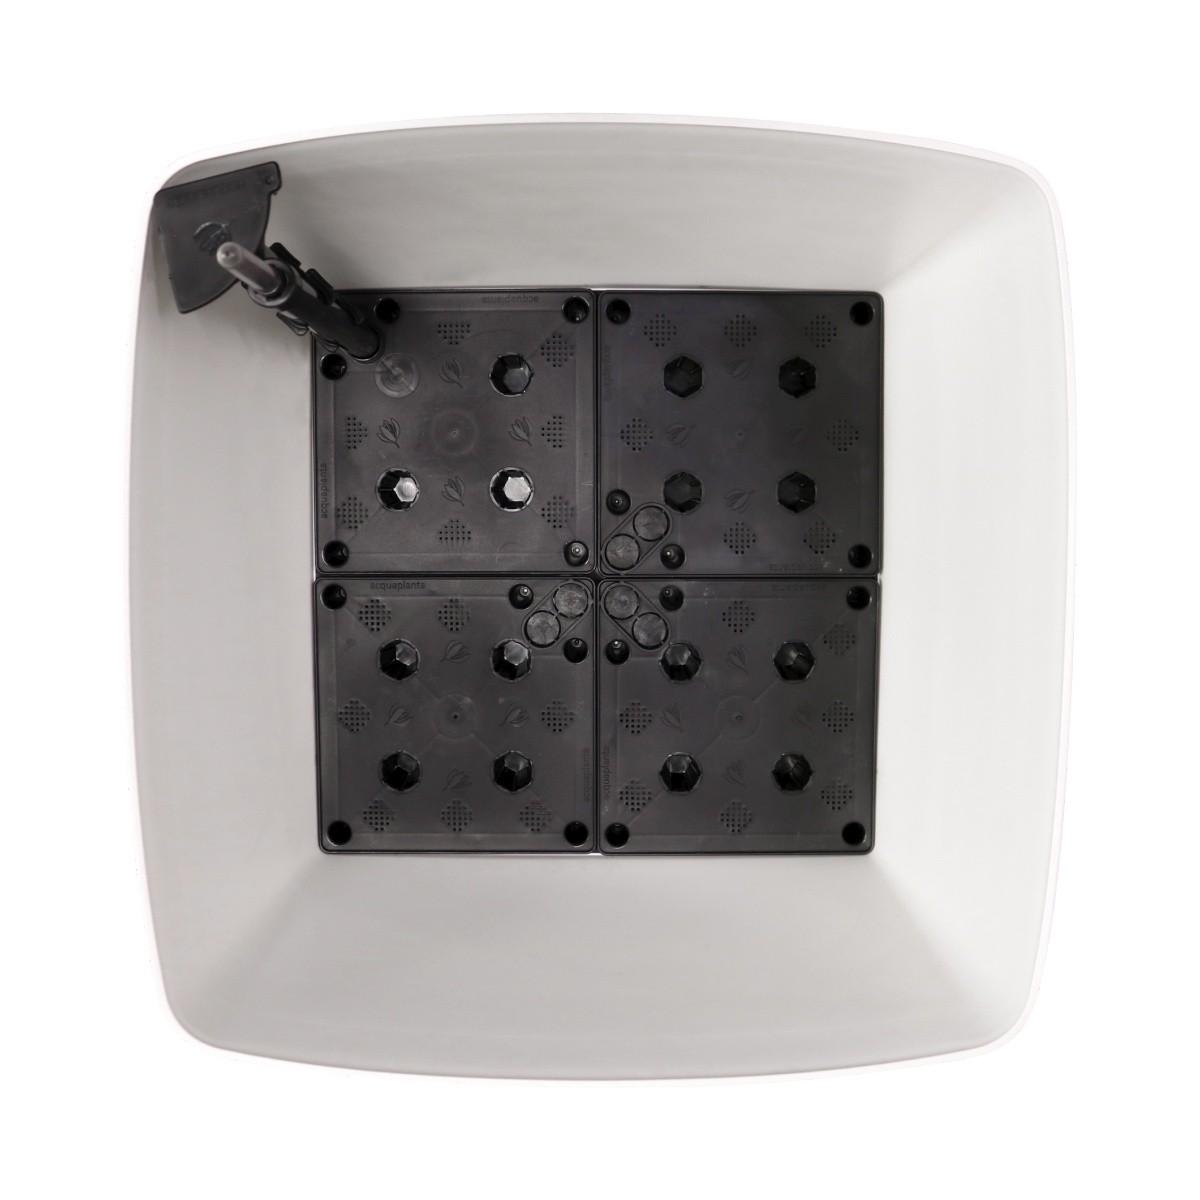 Vaso Autoirrigável Acqua Planta Quadrado Branco 49cm x 49cm